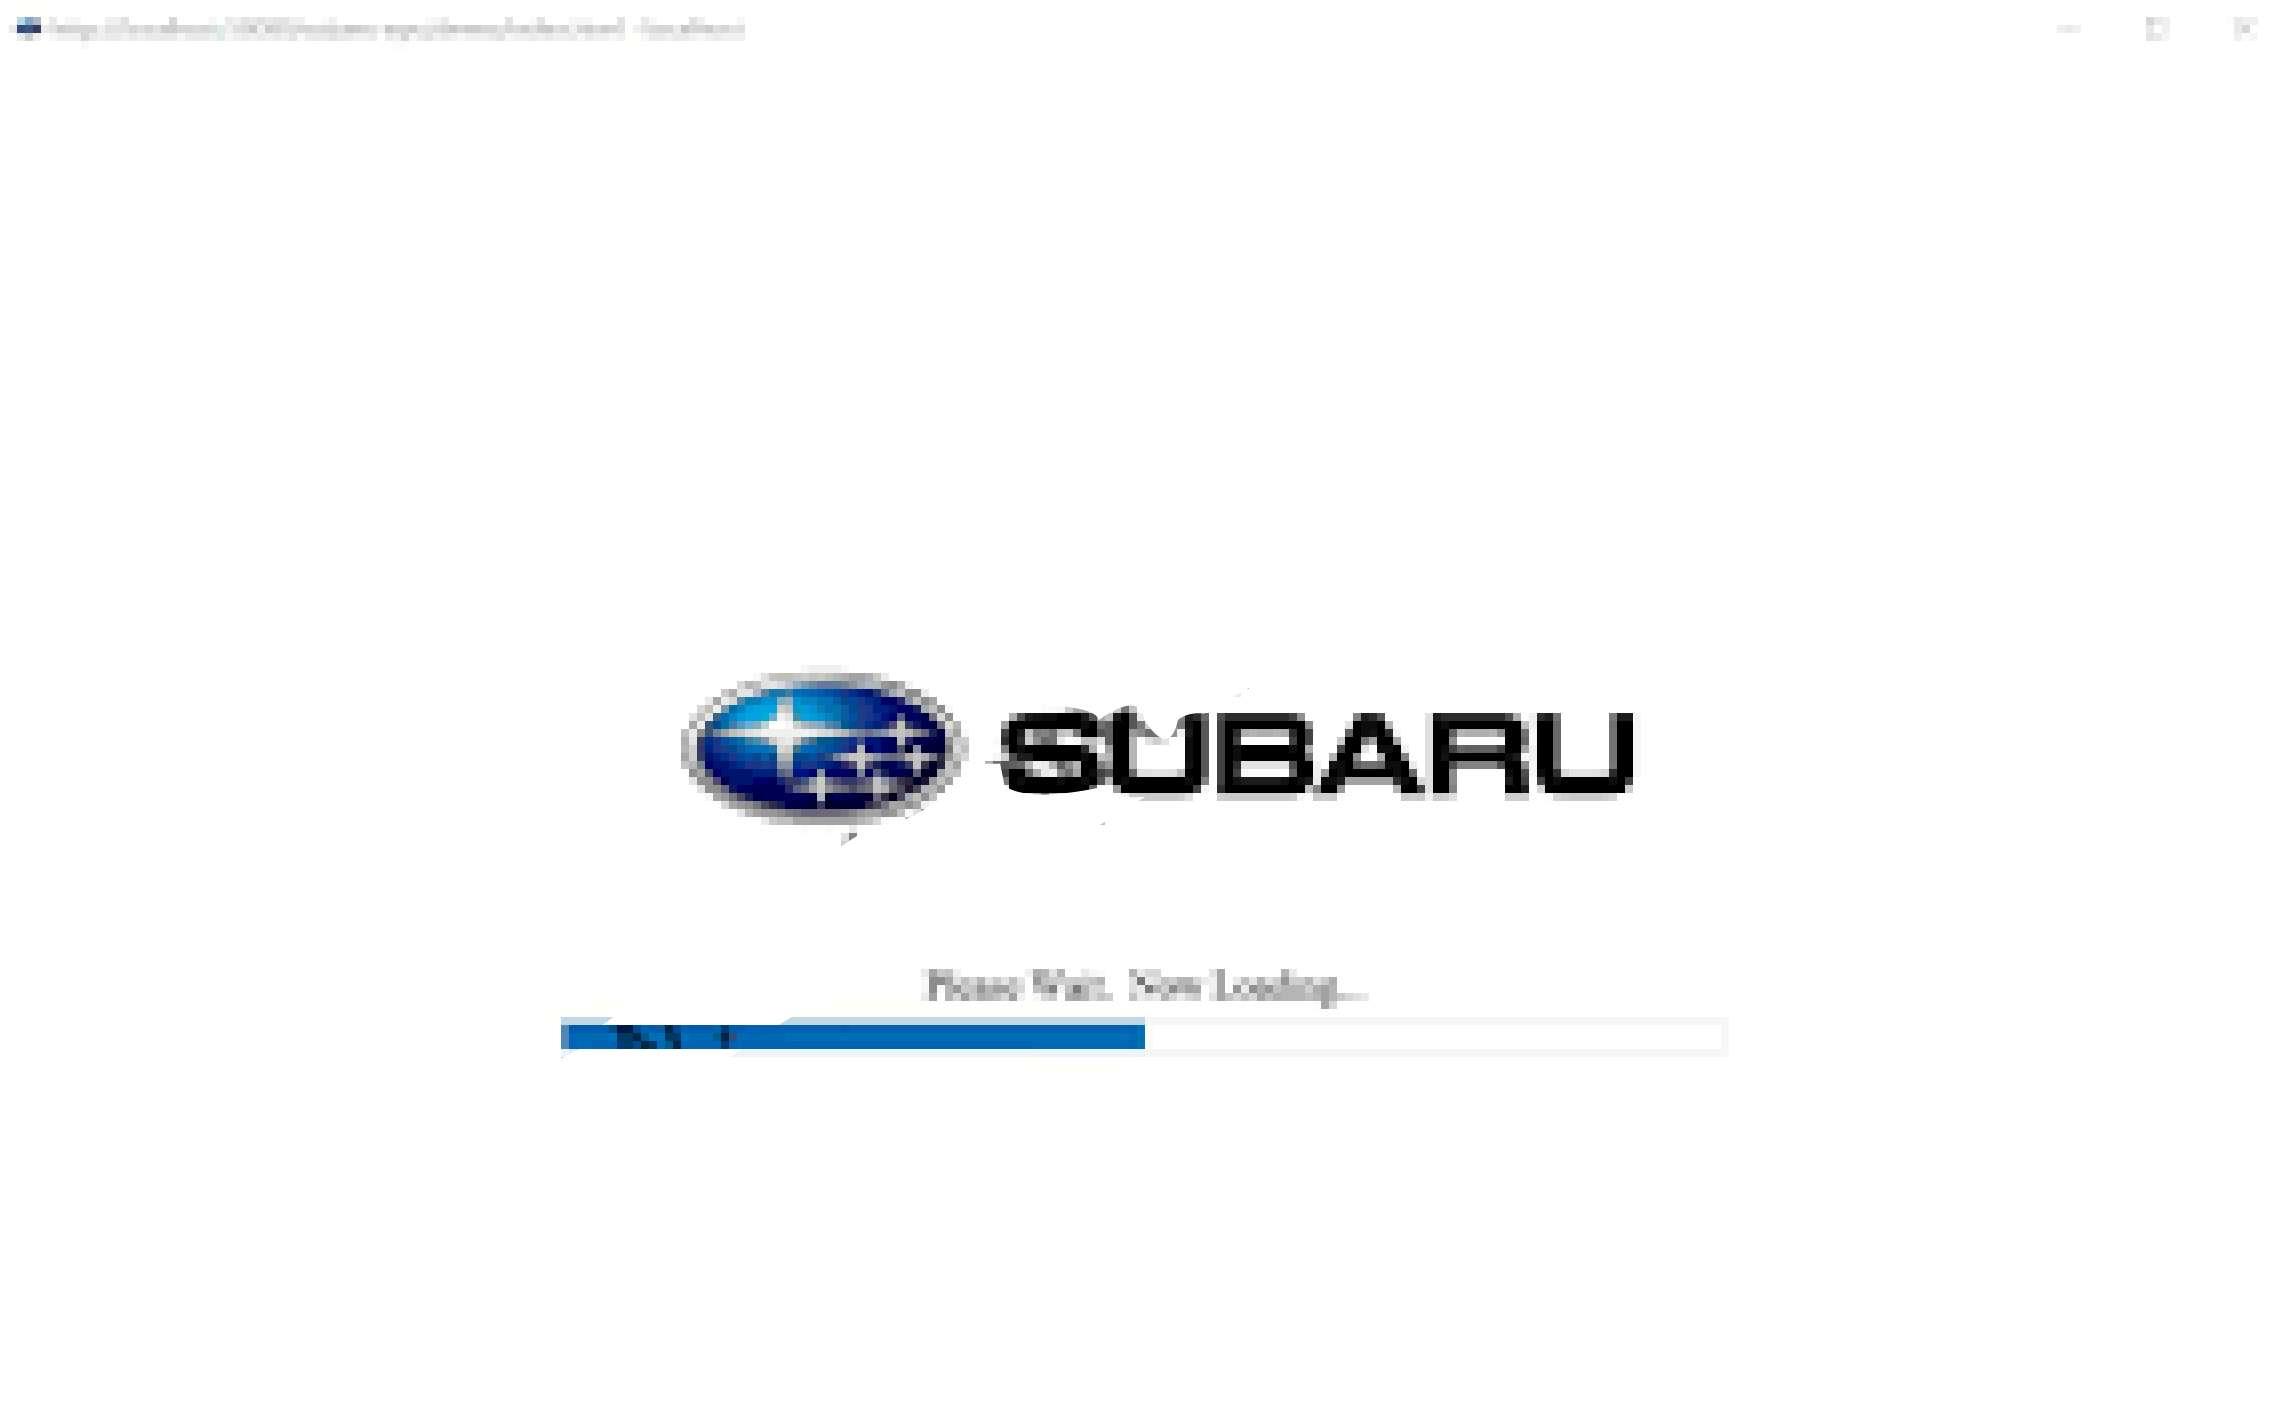 Subaru Fast 3 EPC Europe General 01.2020 ss-01